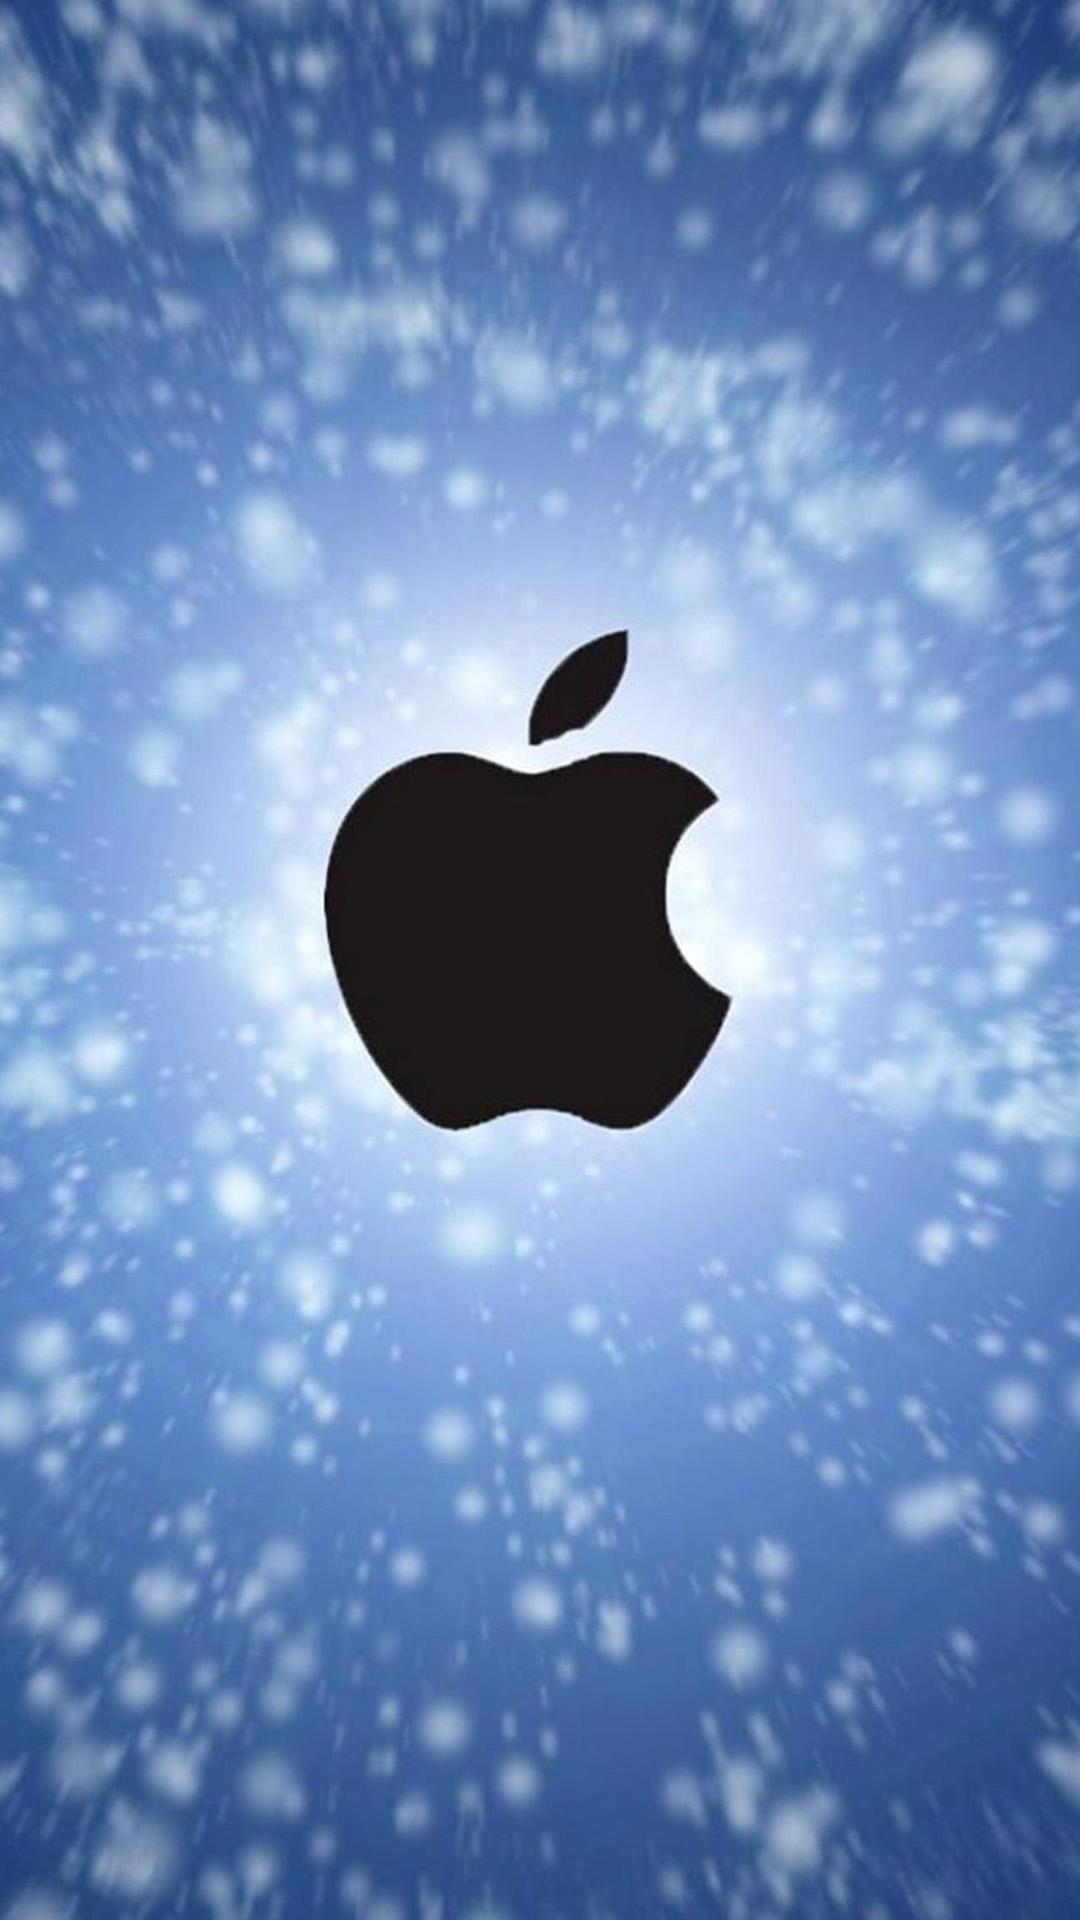 Apple iPhone 6 Plus Wallpaper 96 iPhone 6 Plus Wallpapers HD 1080x1920